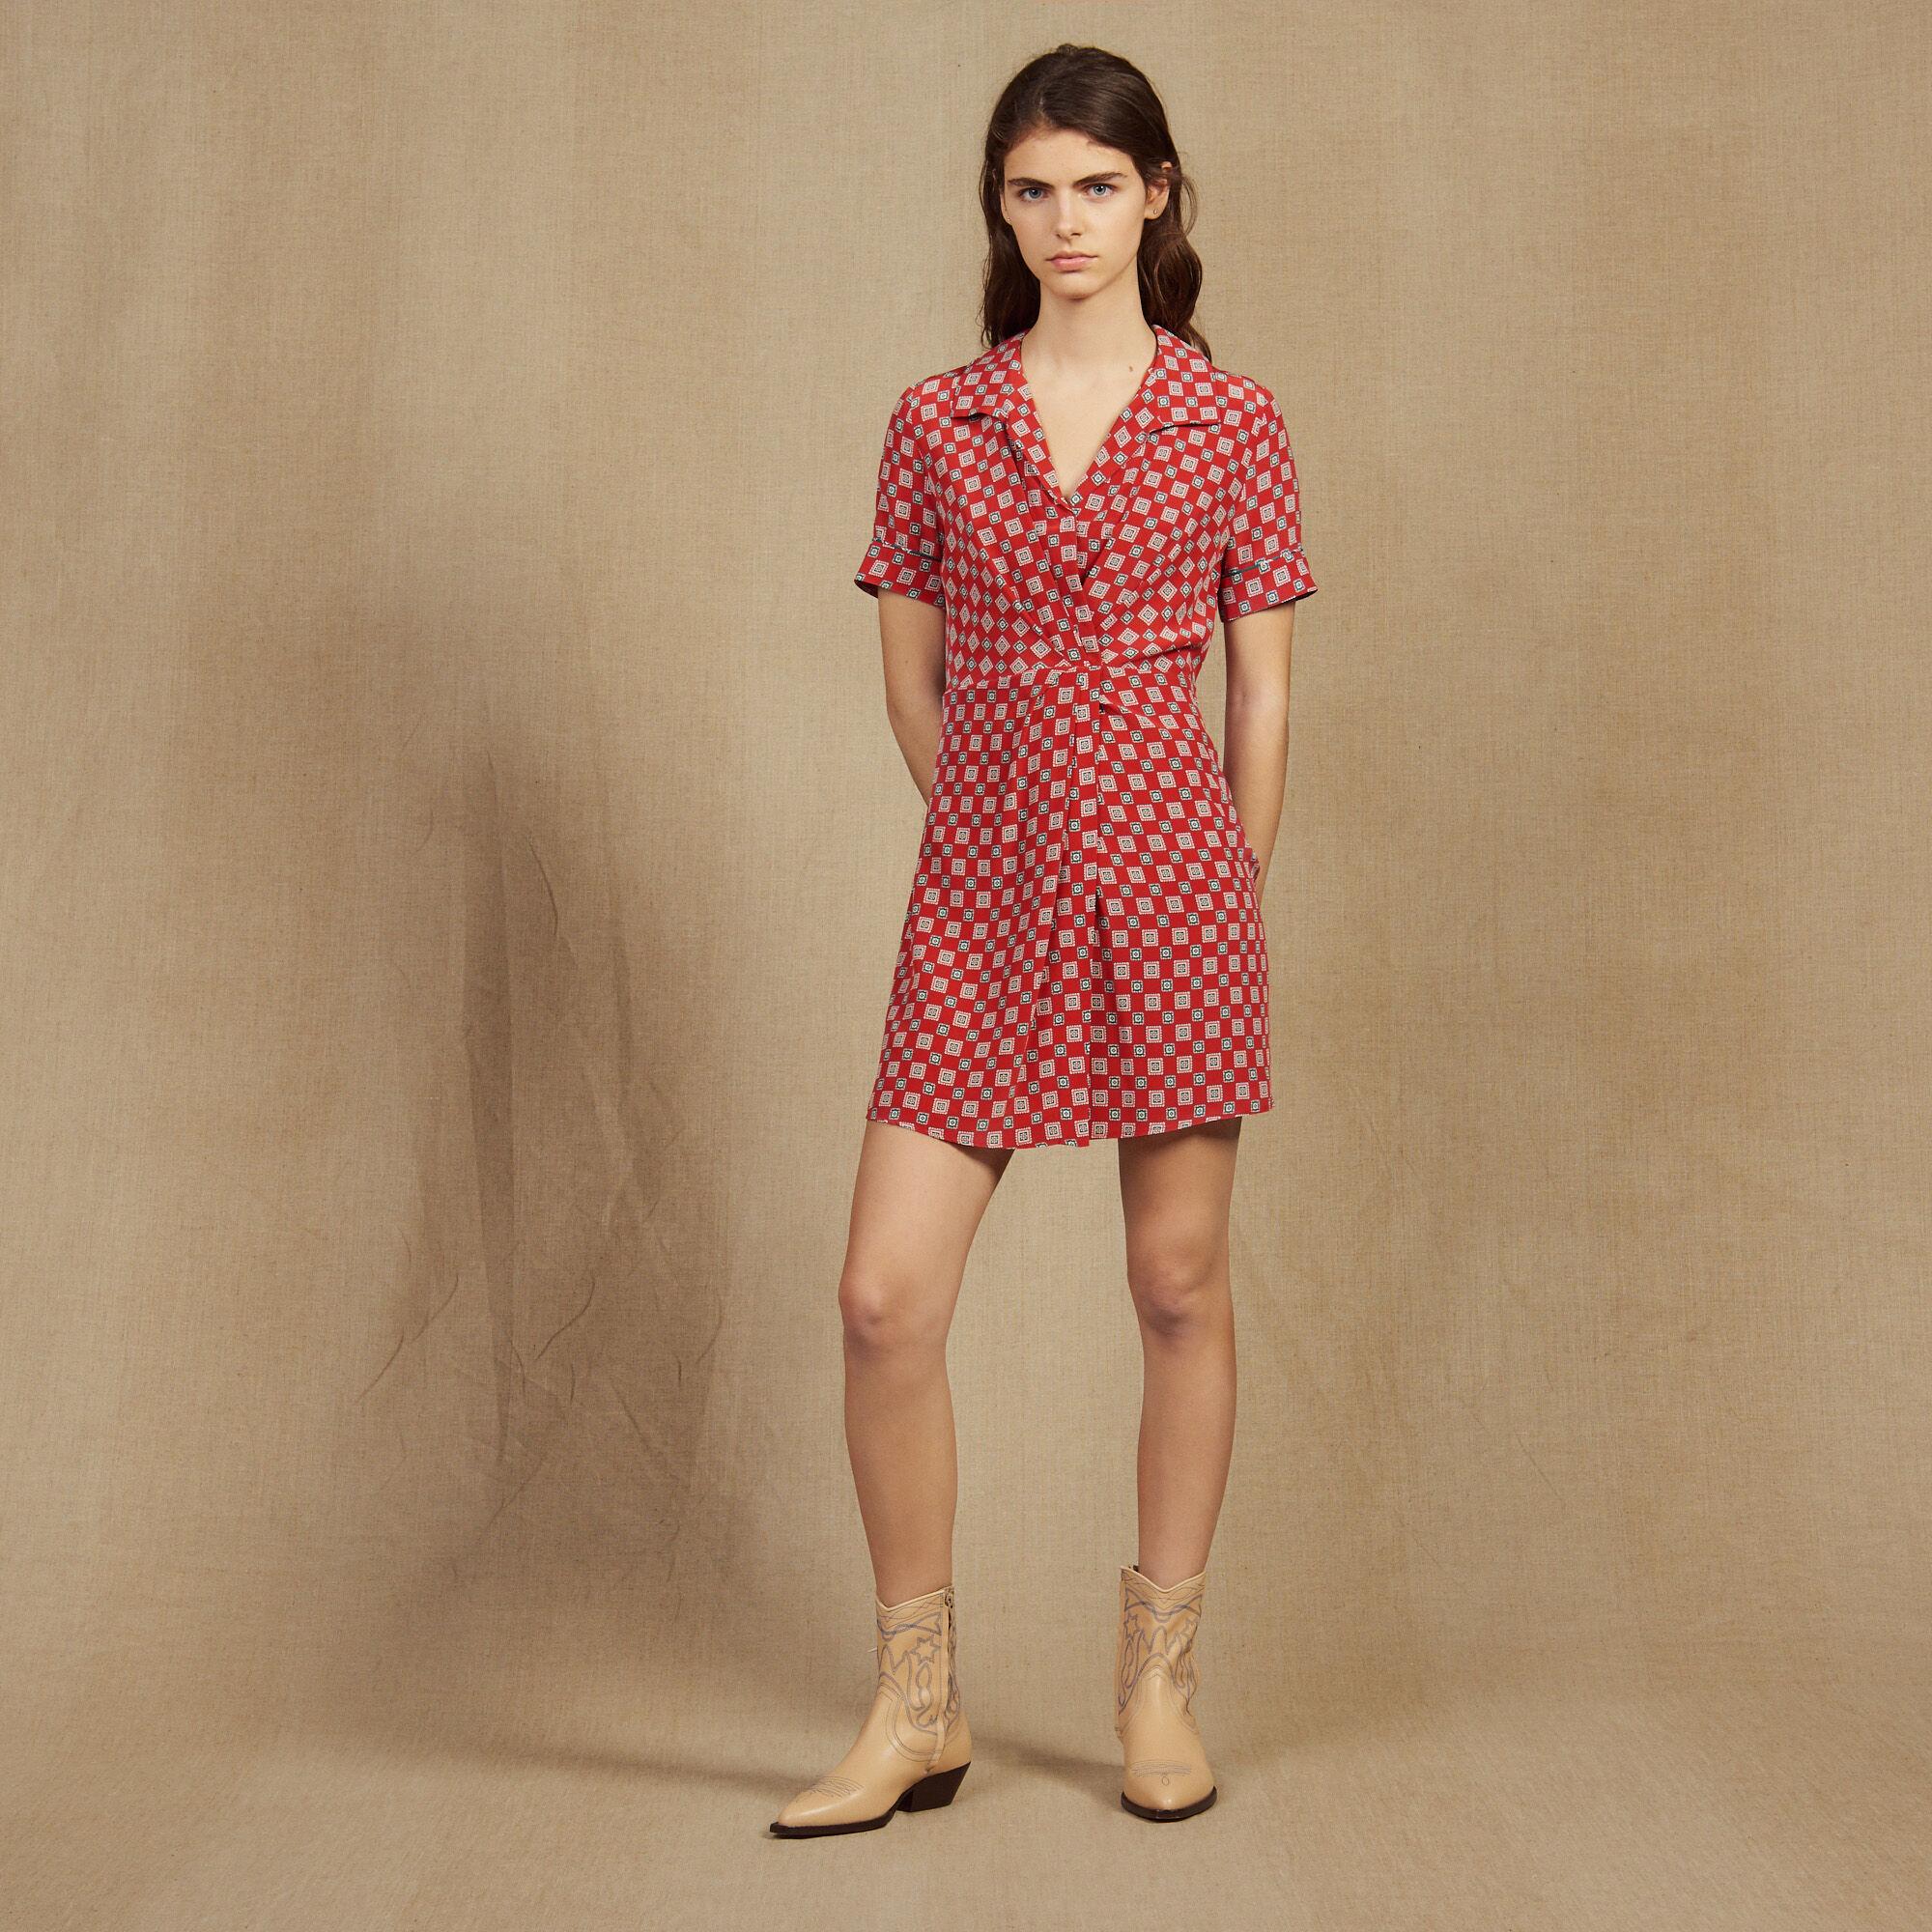 Petite robe rouge satin